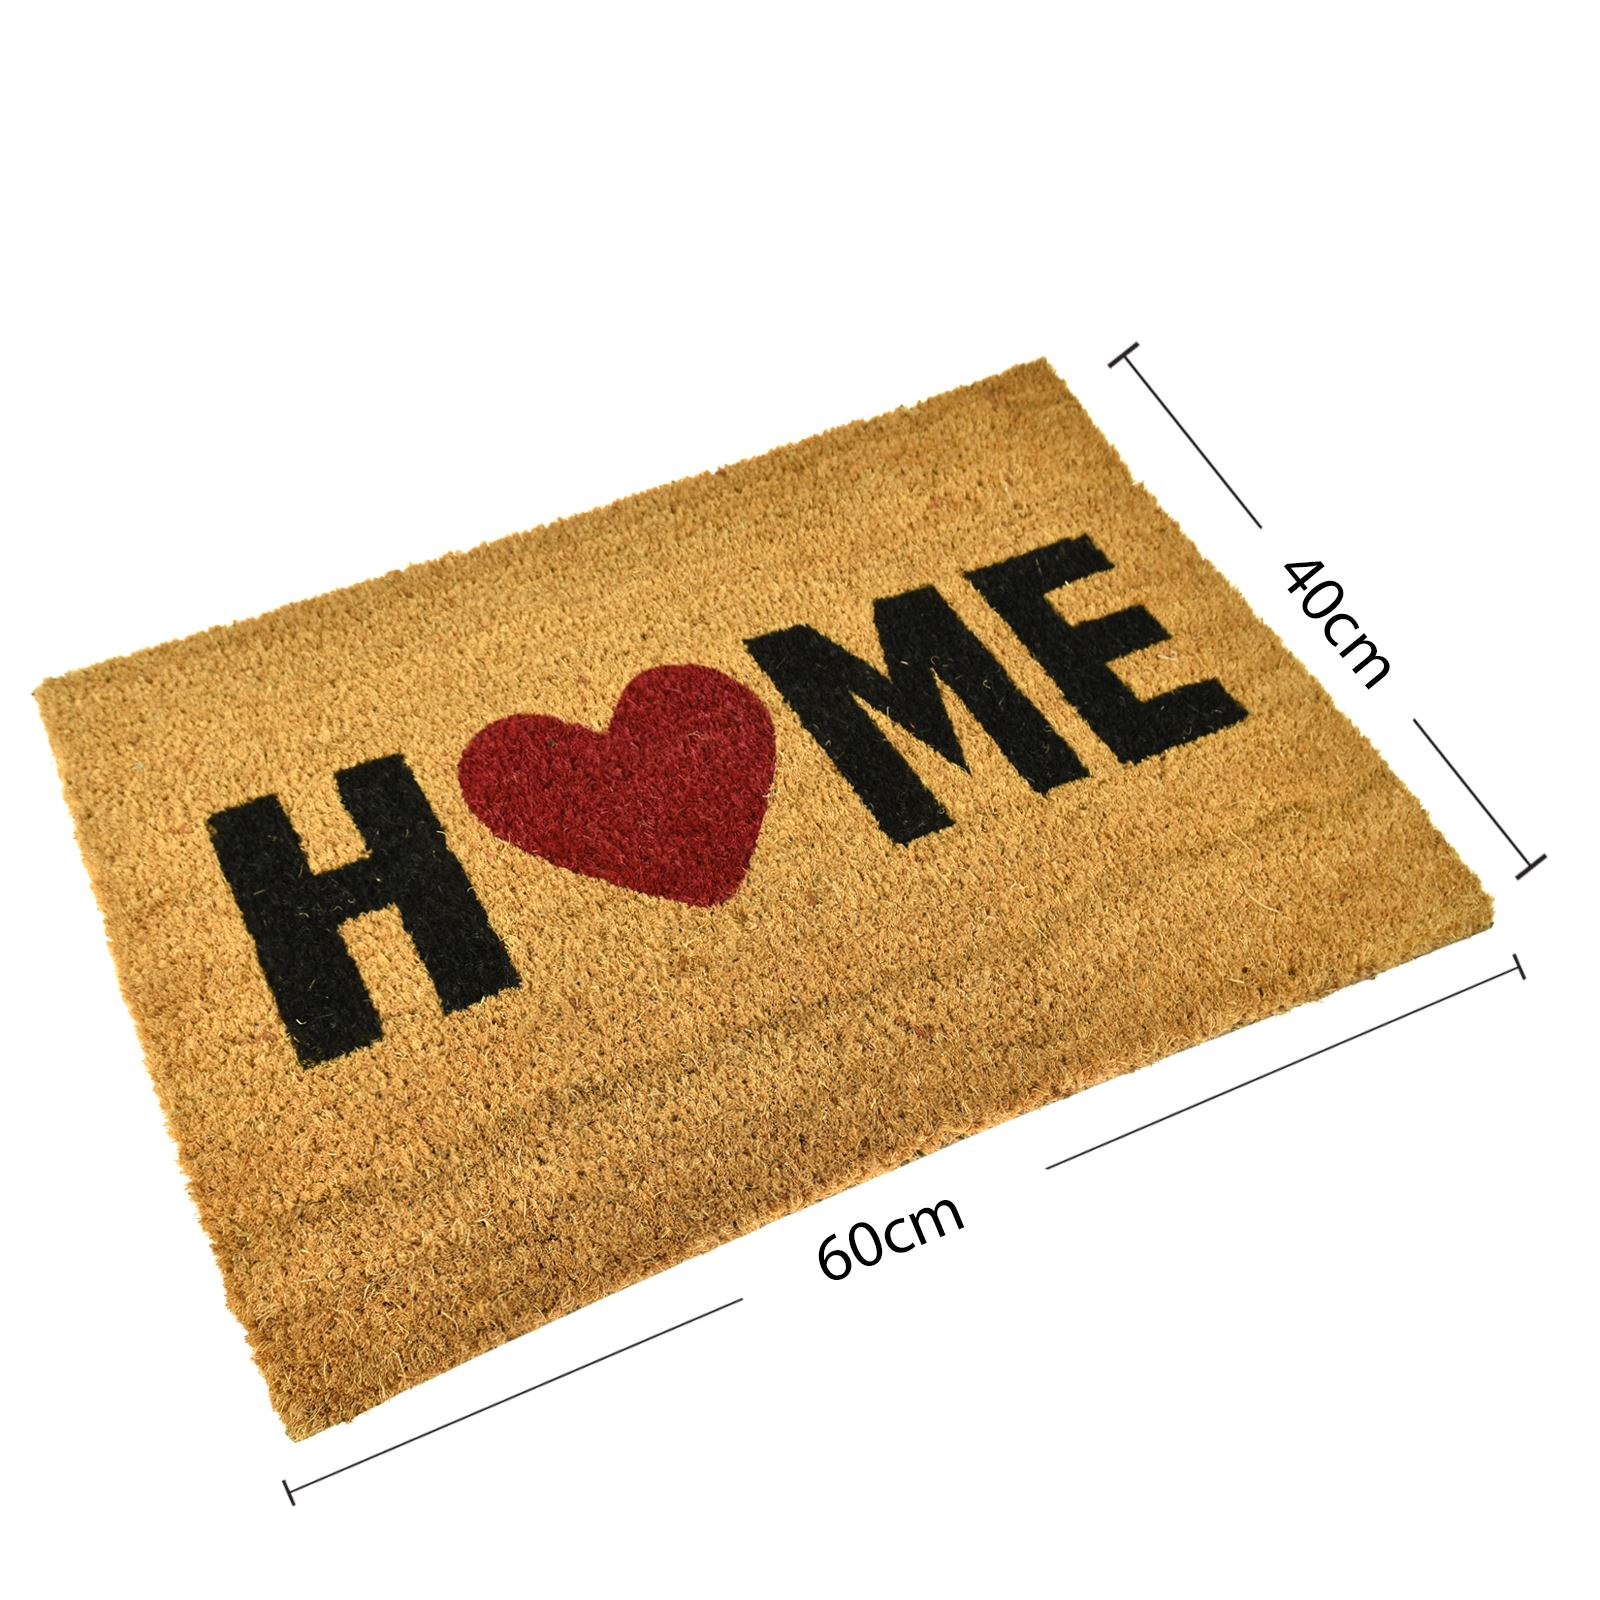 Plain-Non-Slip-Door-Mat-Tough-Natural-Coir-PVC-Back-Welcome-Doormat-40-x-60cm miniatura 50